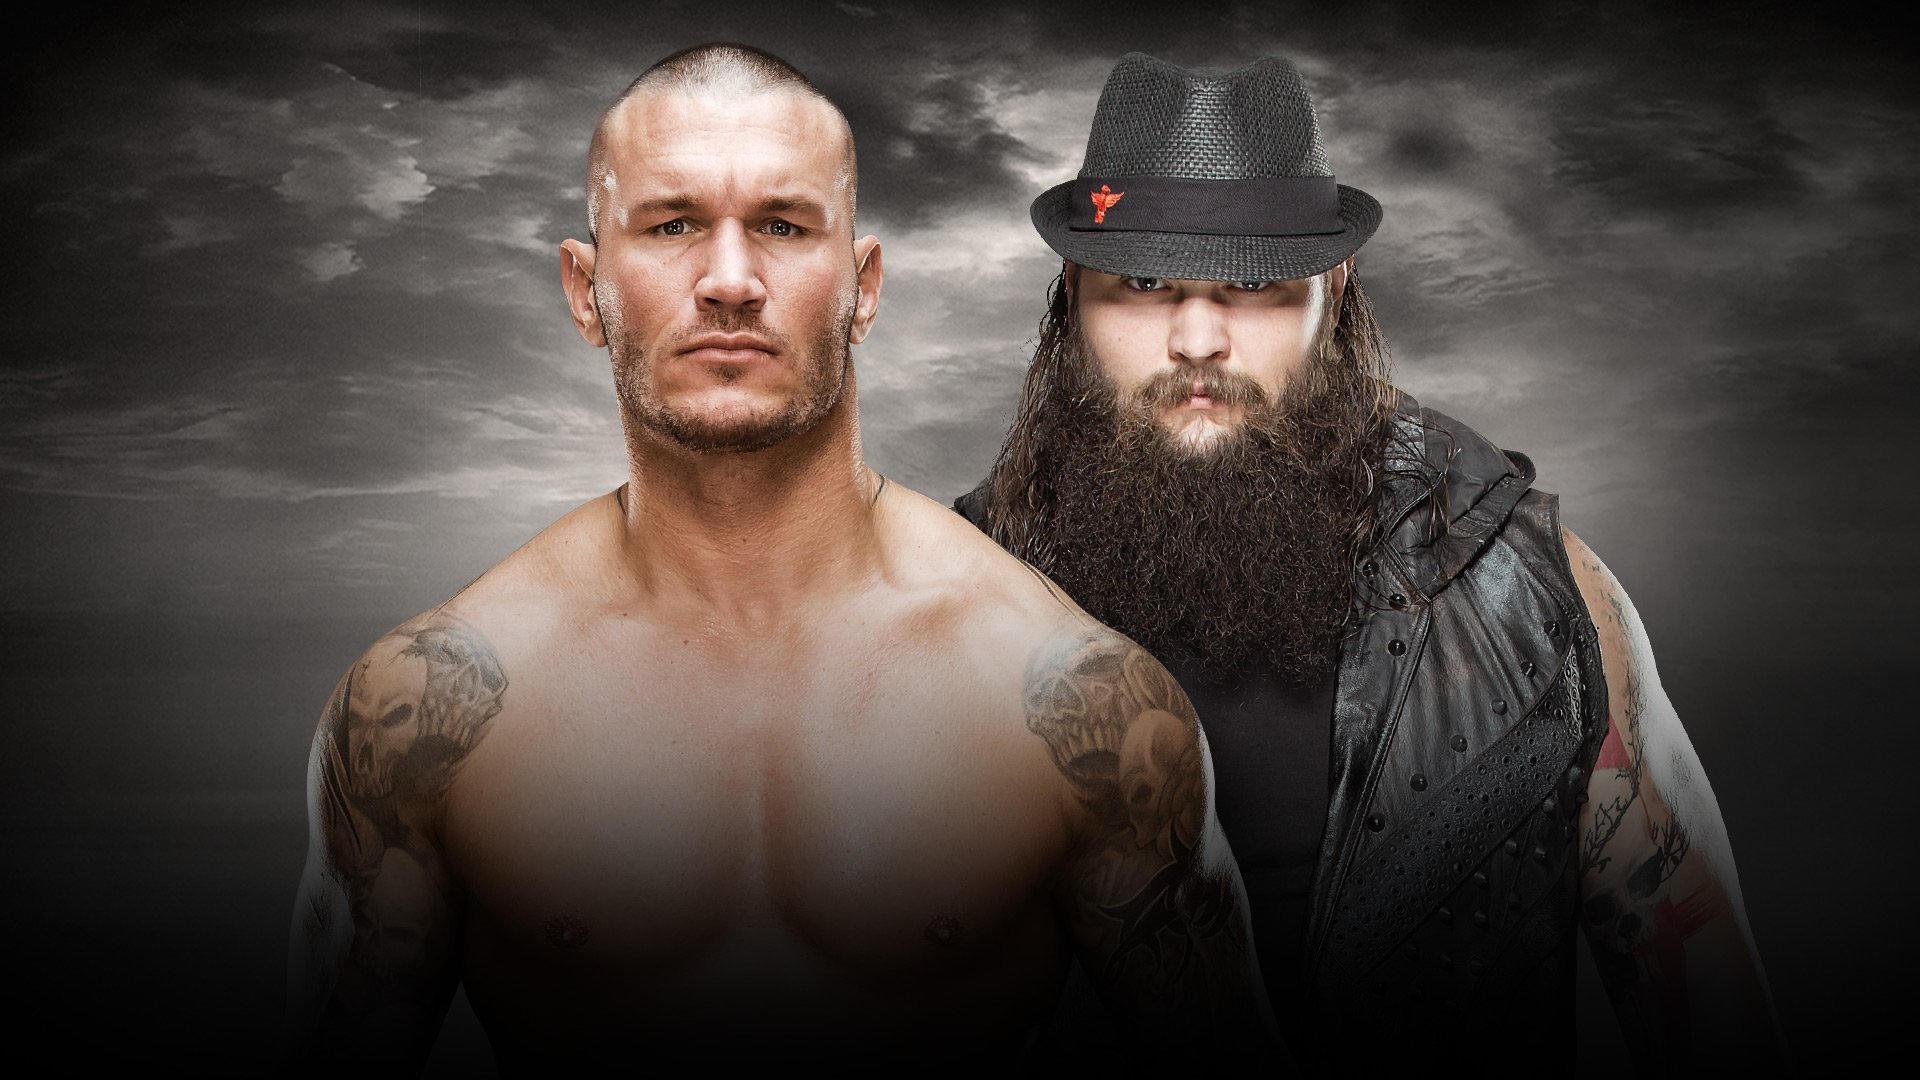 WWE NO MERCY - OCTOBER 9 - SACRAMENTO, CALIFORNIA 20160927_Nomercy_OrtonWyatts--498f36e0b8cca37730d60fade0265382